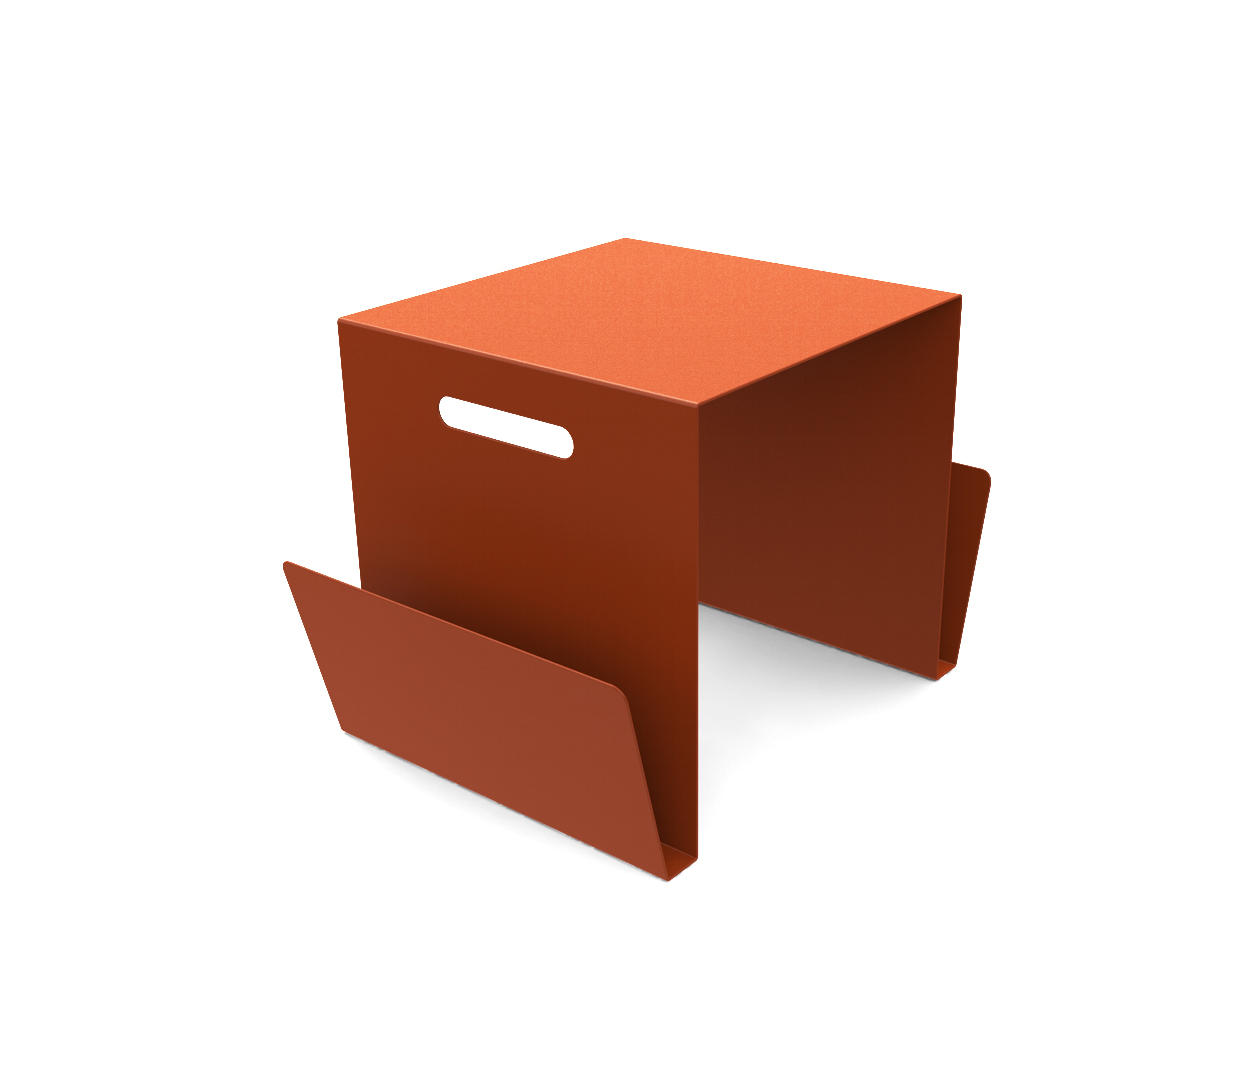 solano table basse porte revues tables d 39 appoint de mati re grise architonic. Black Bedroom Furniture Sets. Home Design Ideas